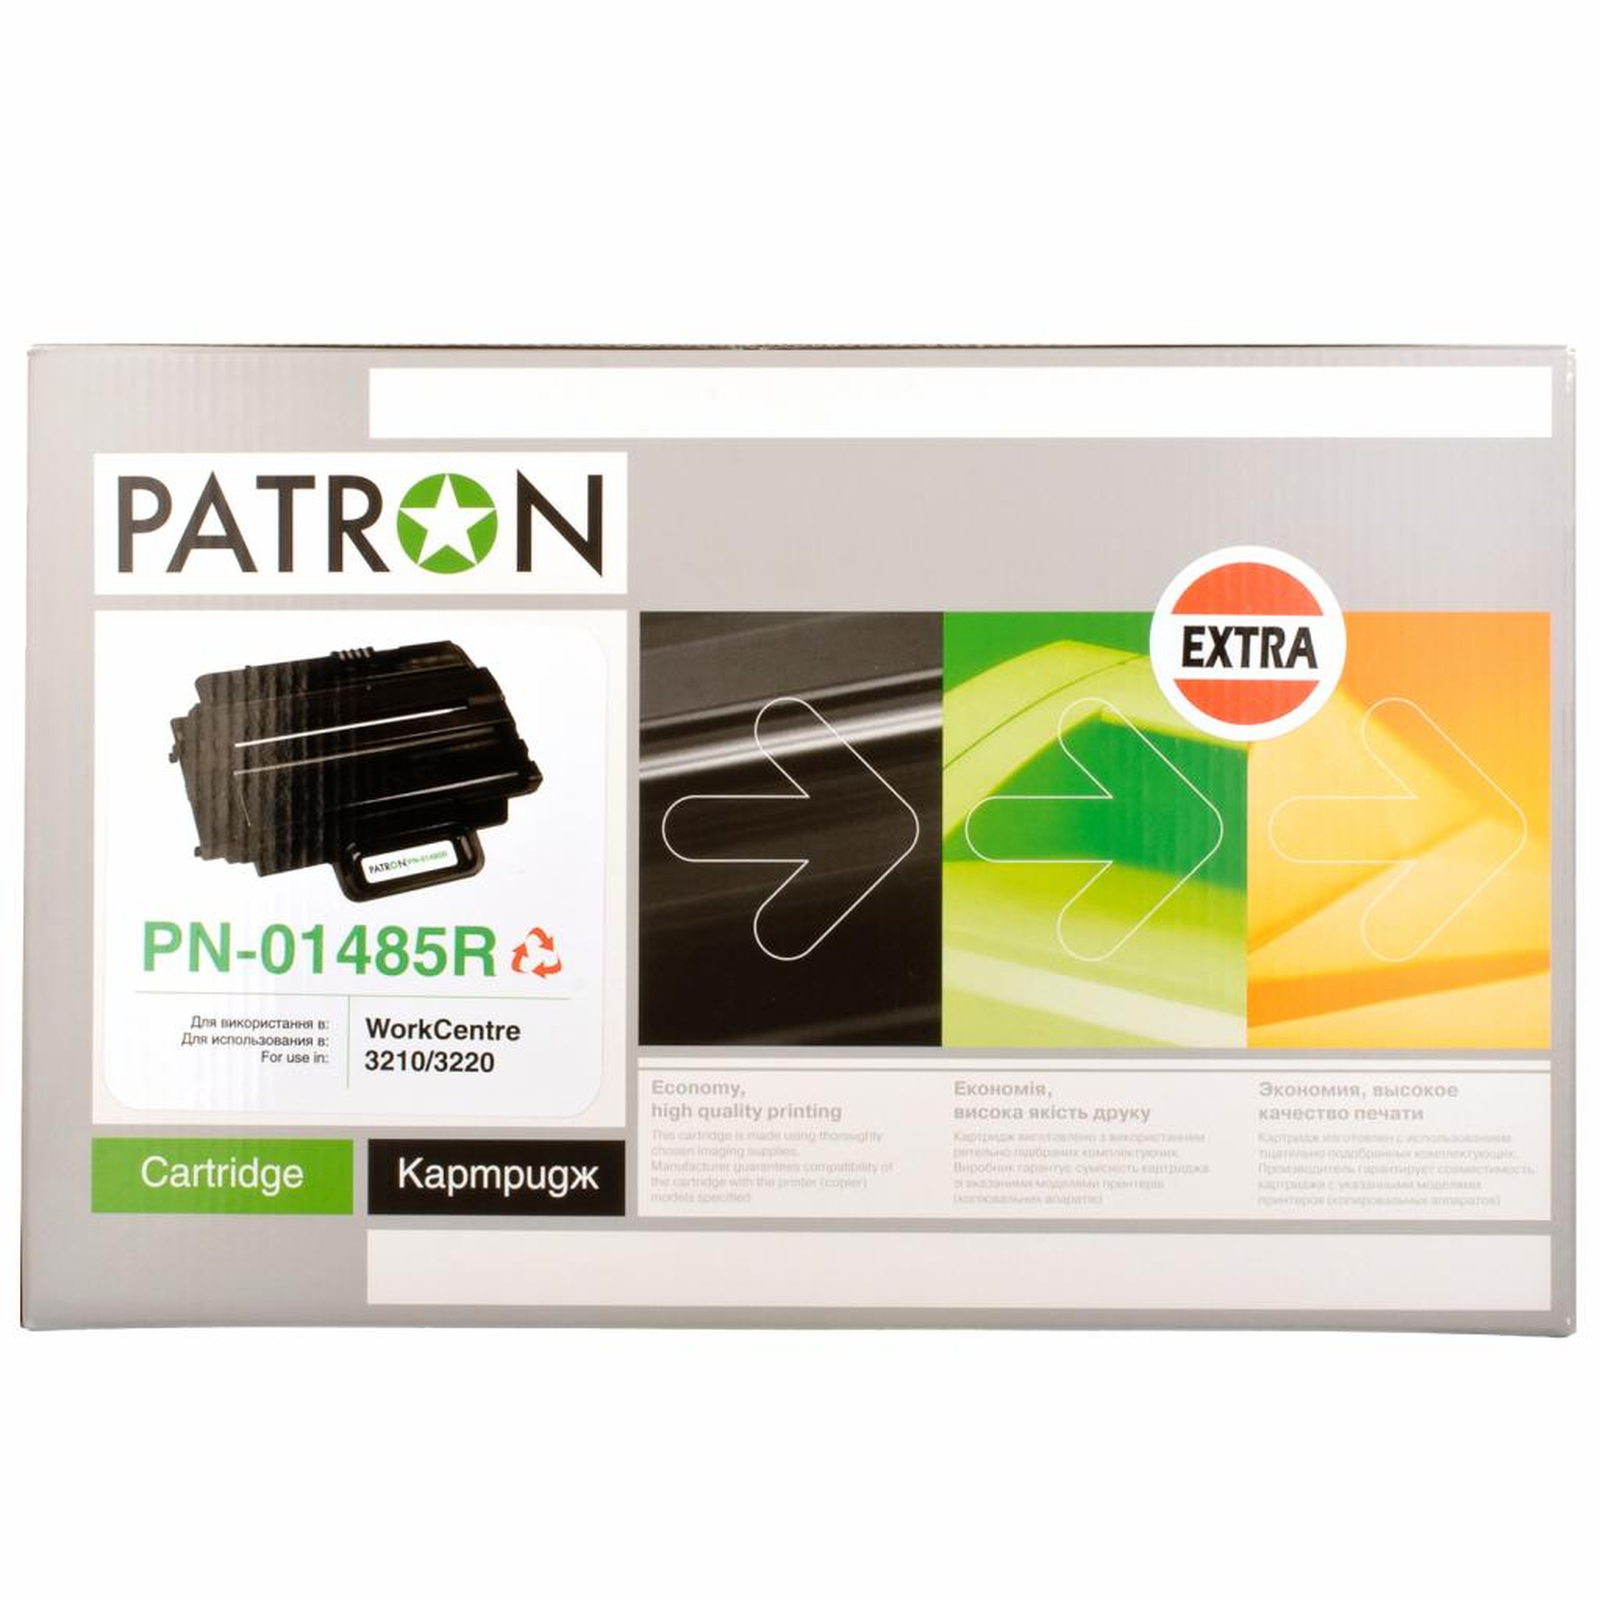 Картридж PATRON XEROX WC 3210/3220 Extra (PN-01485R) изображение 2